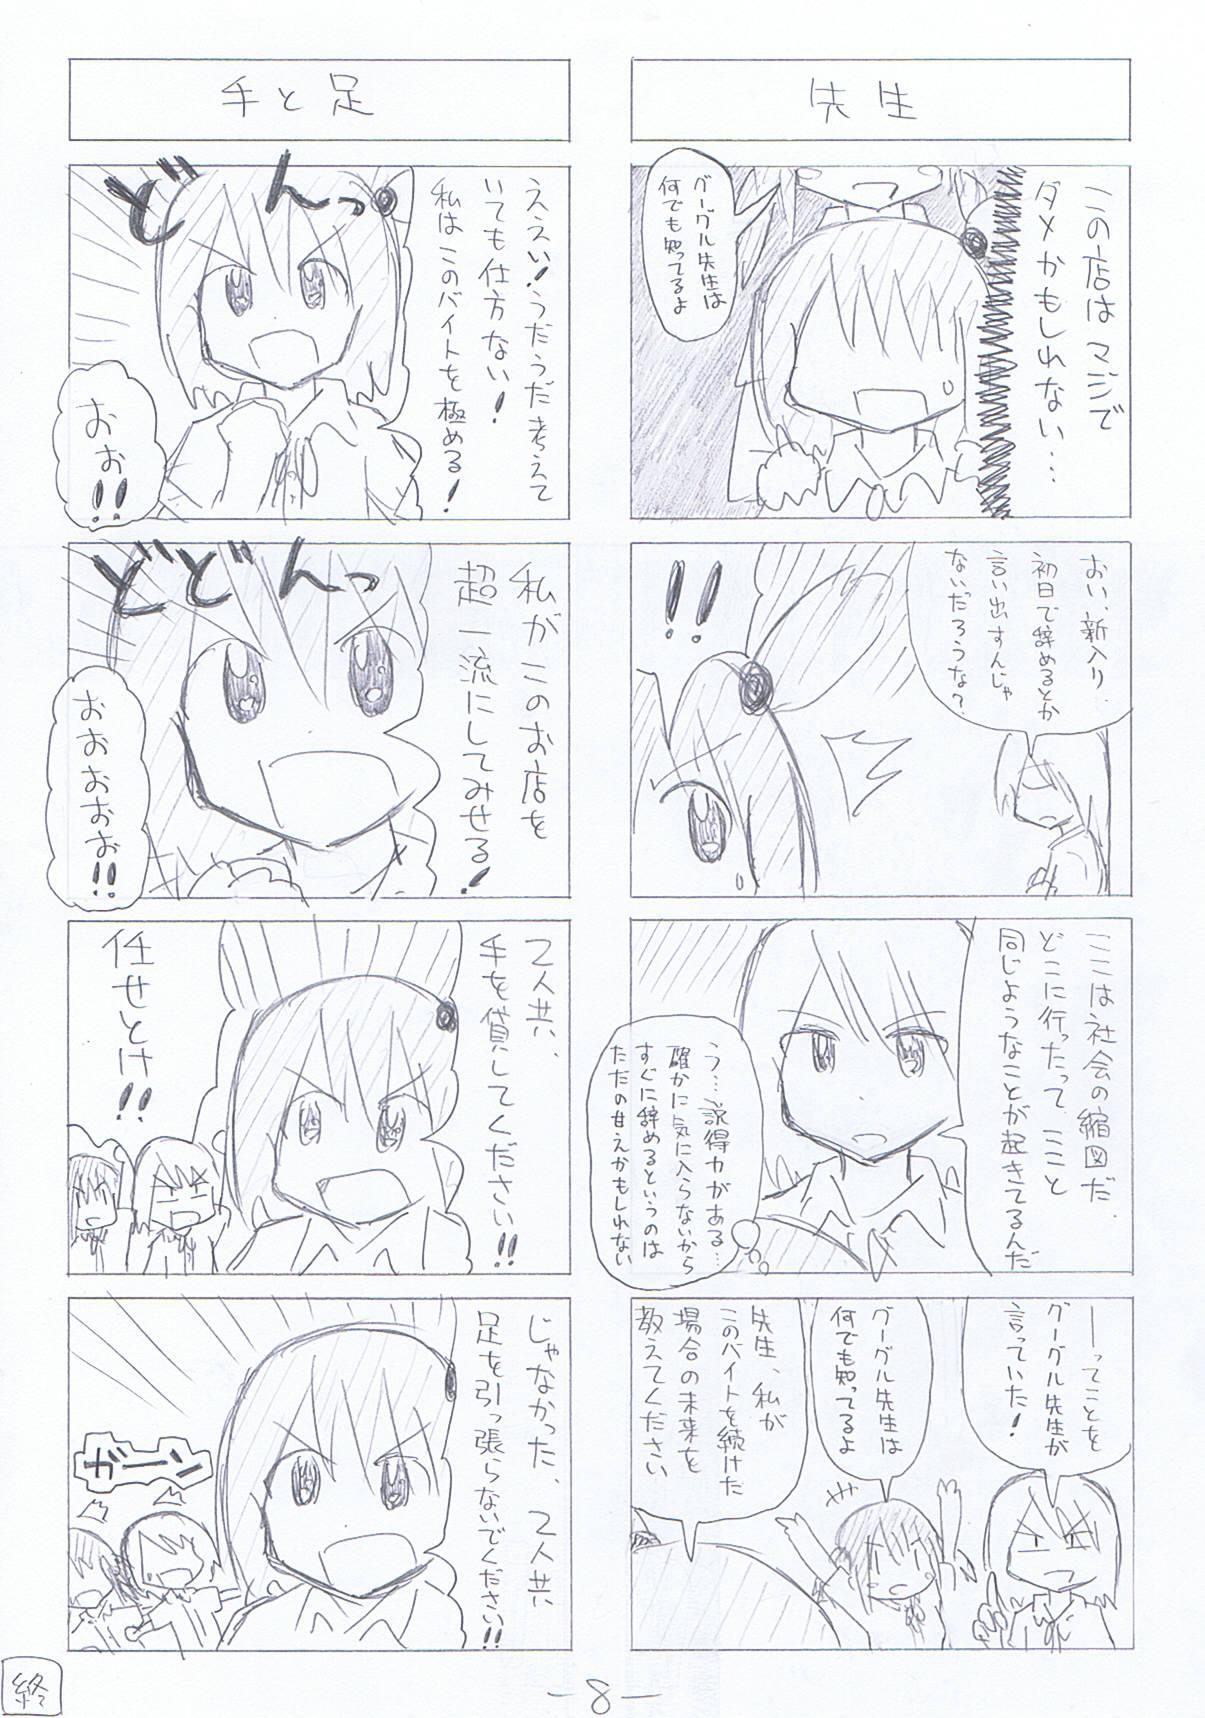 hitotoki-1-8.jpg